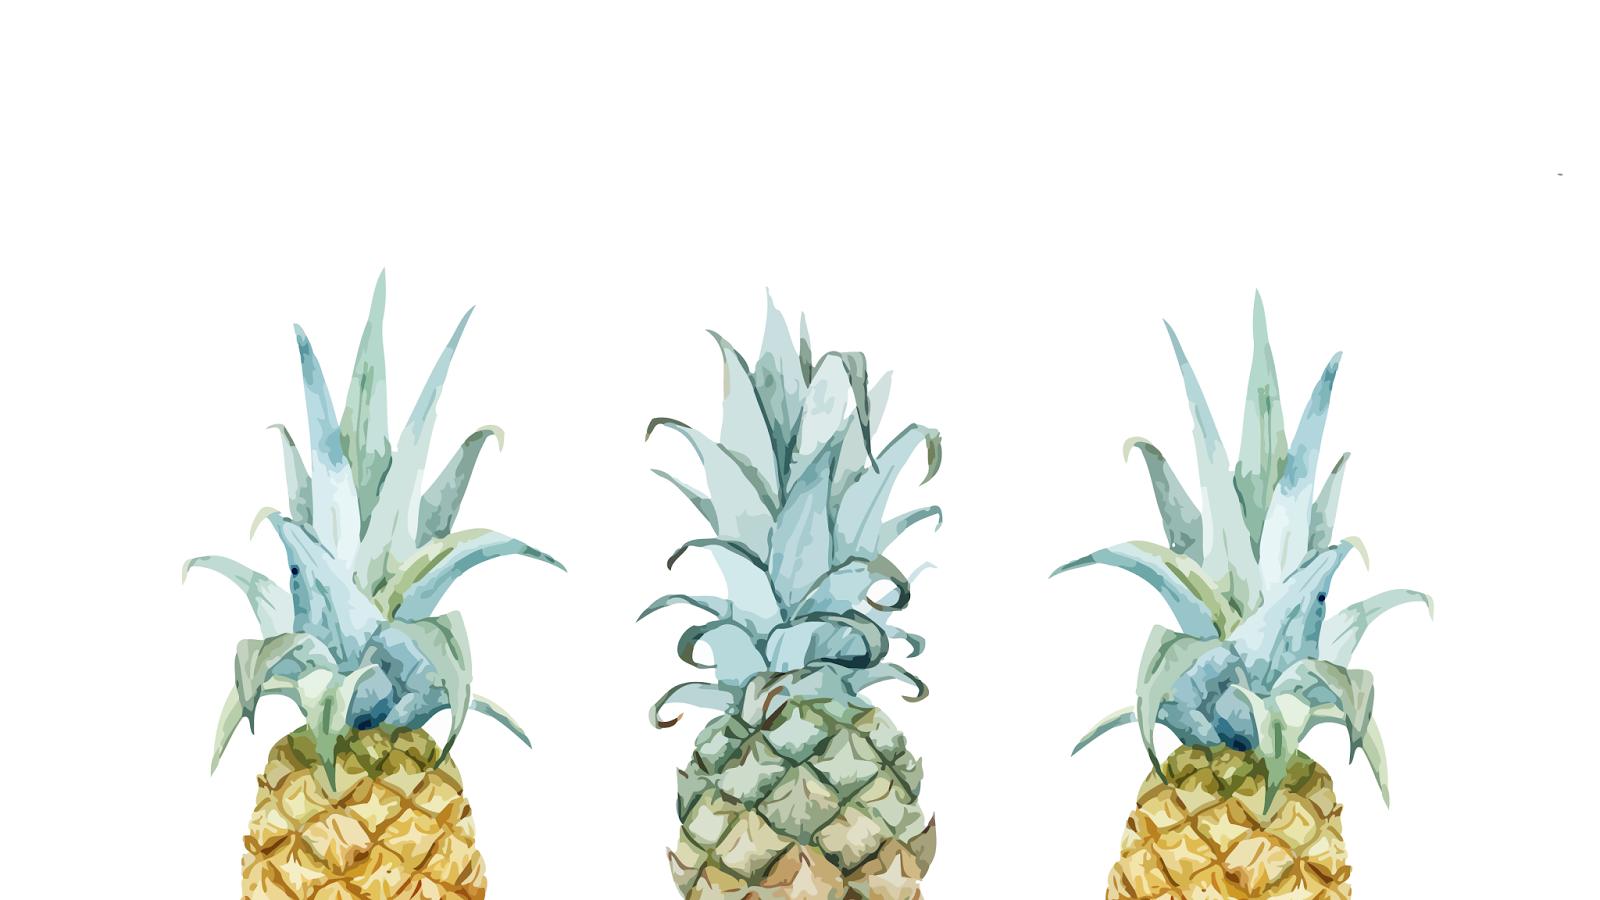 Best Wallpaper Mac Pineapple - e0d7019b349db8b91c77fdae424b360c  Perfect Image Reference_244960.png